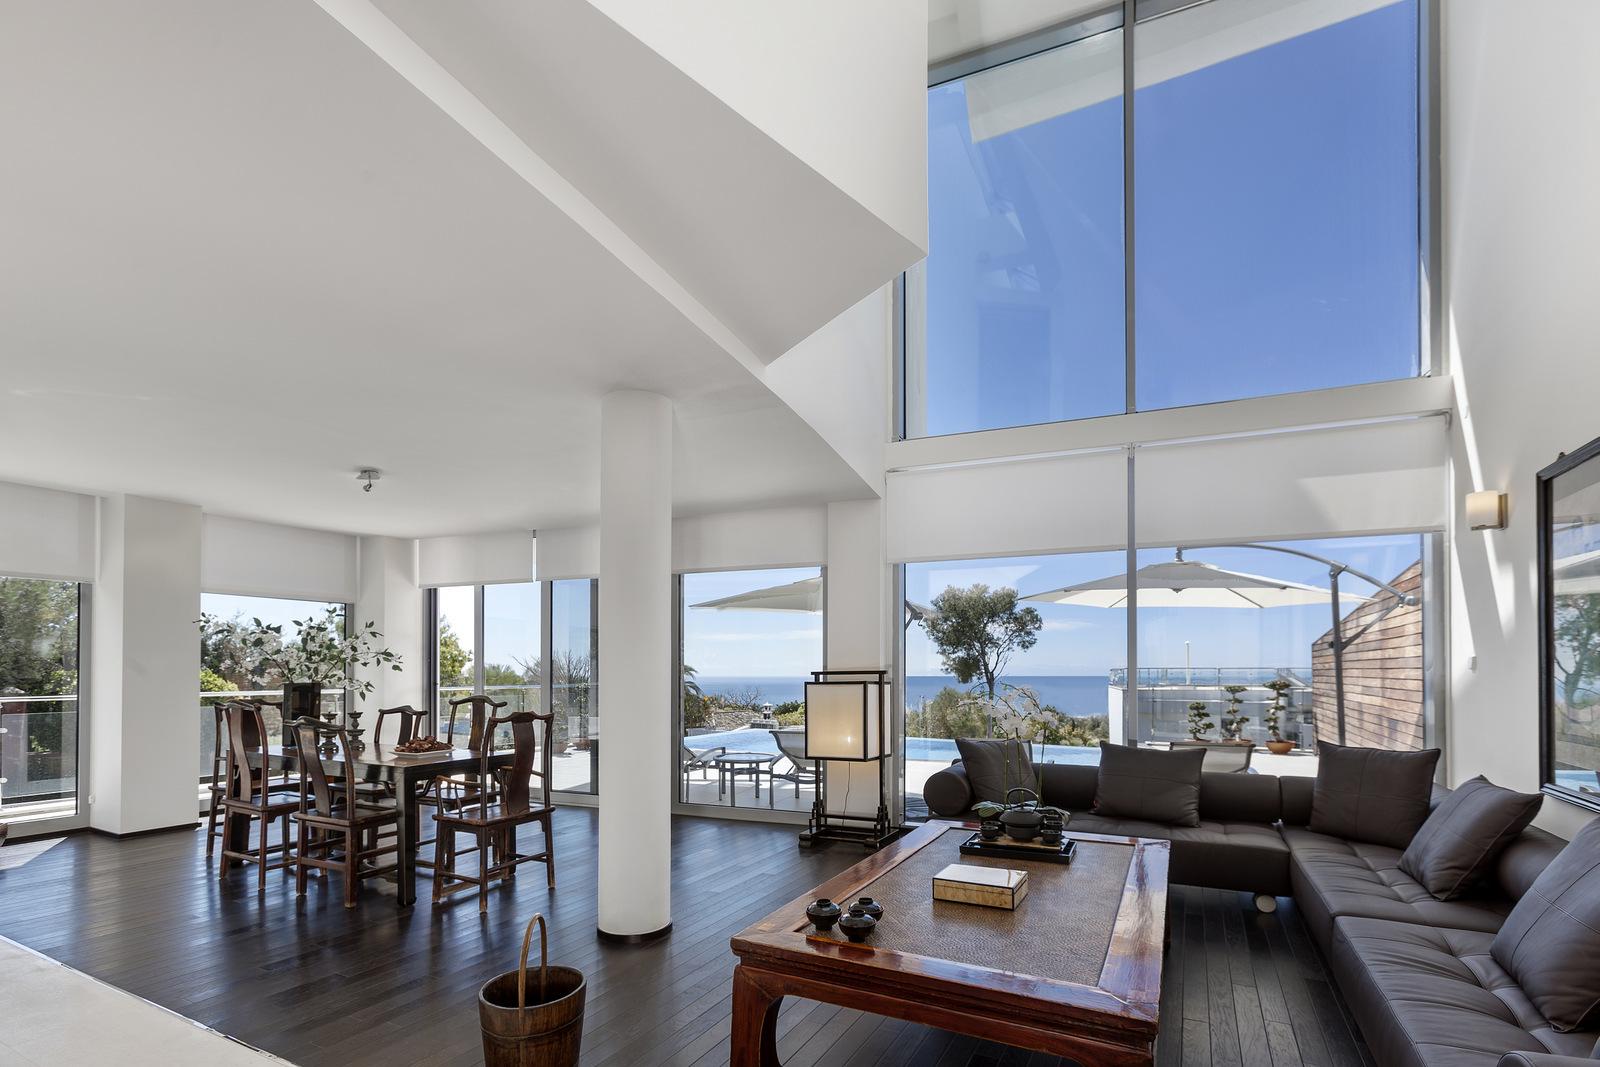 Modern Aesthetic in Meisho Hills, Marbella